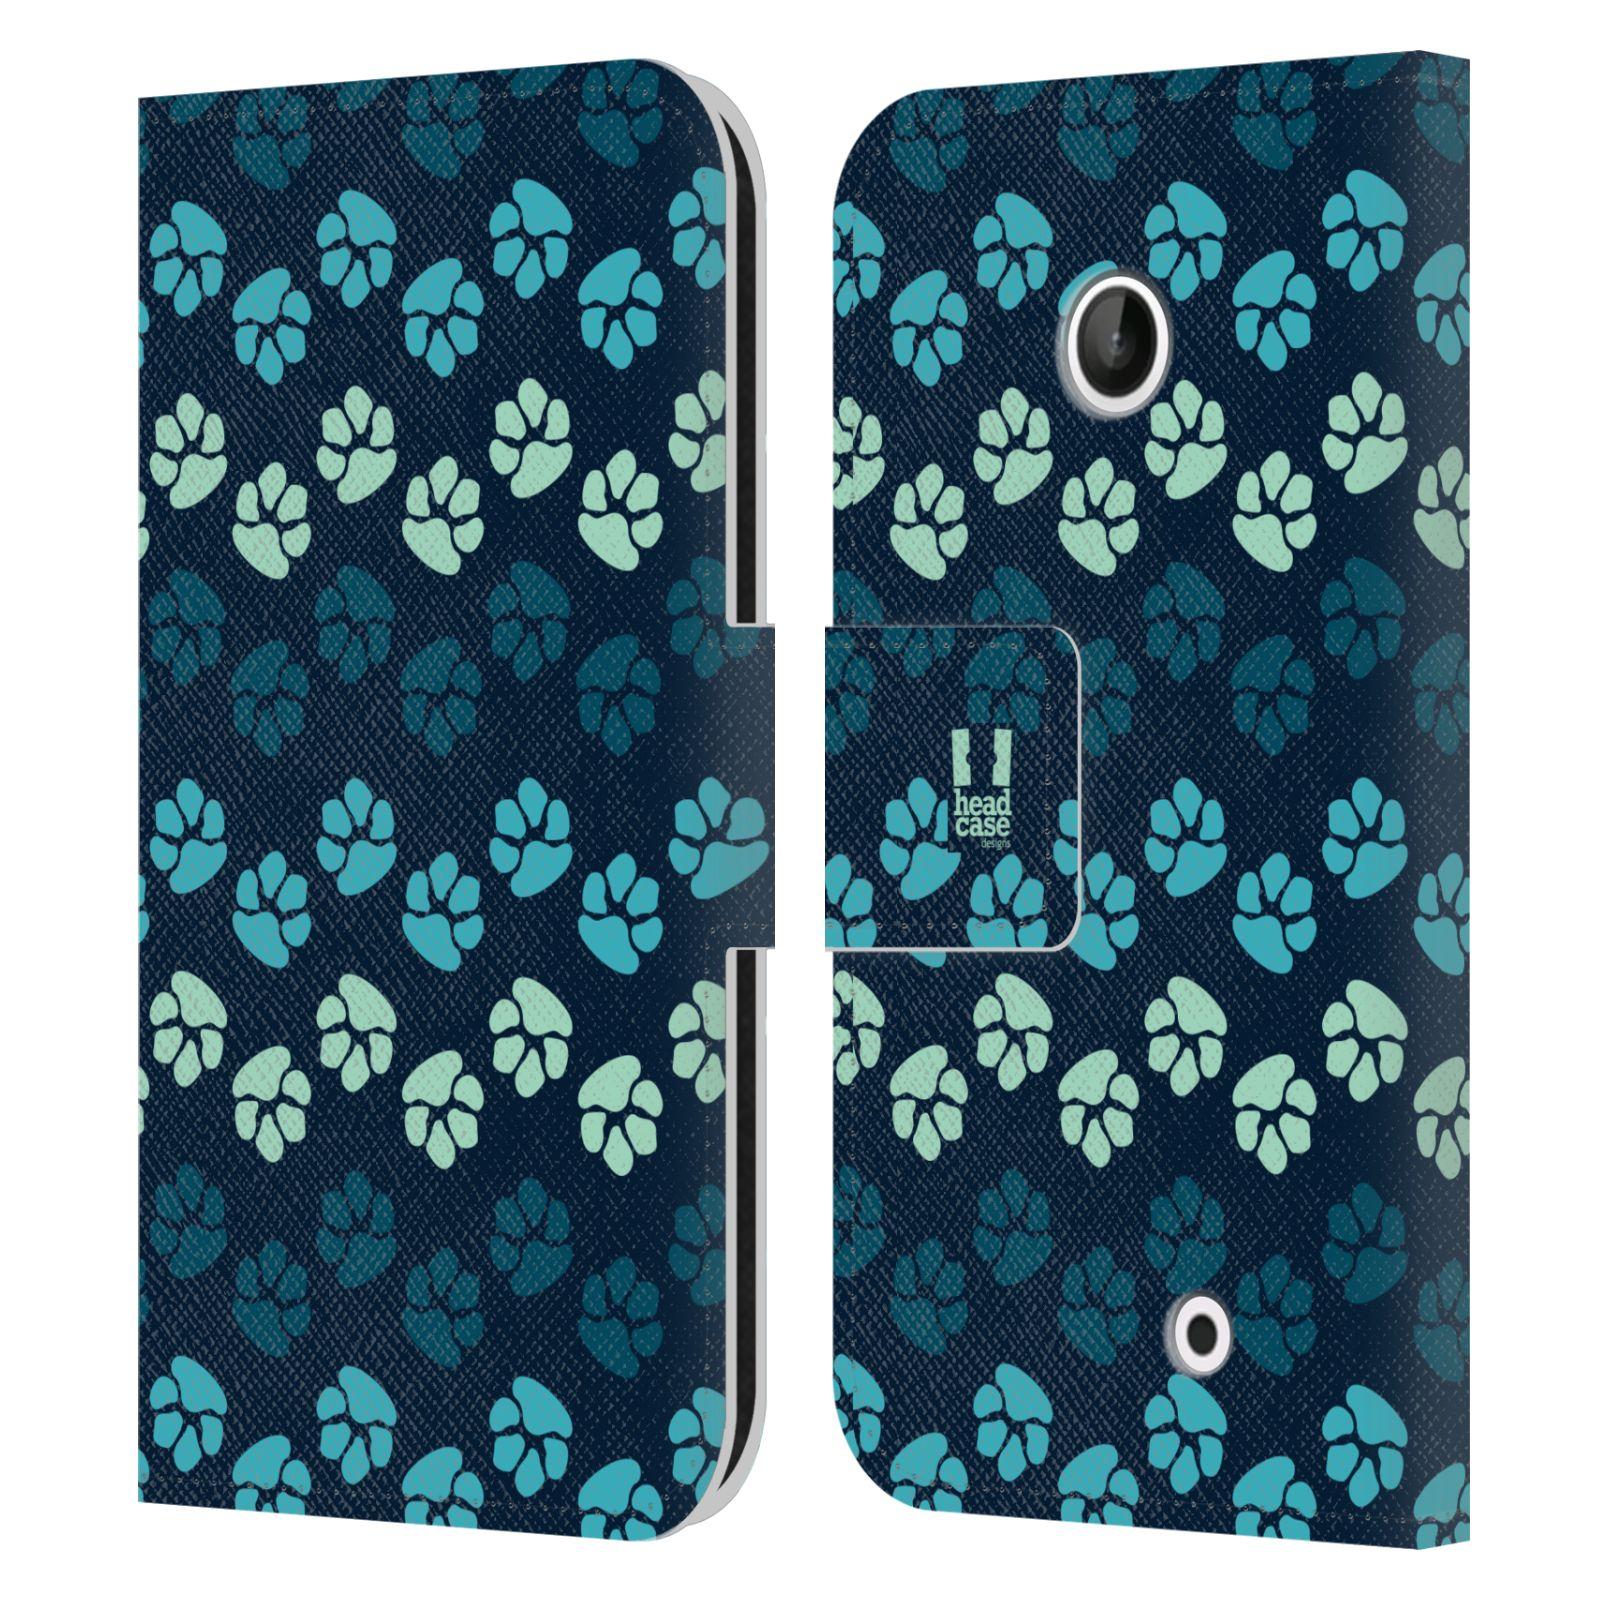 HEAD CASE Flipové pouzdro pro mobil NOKIA LUMIA 630 / LUMIA 630 DUAL Pejsek ťapky modrá barva